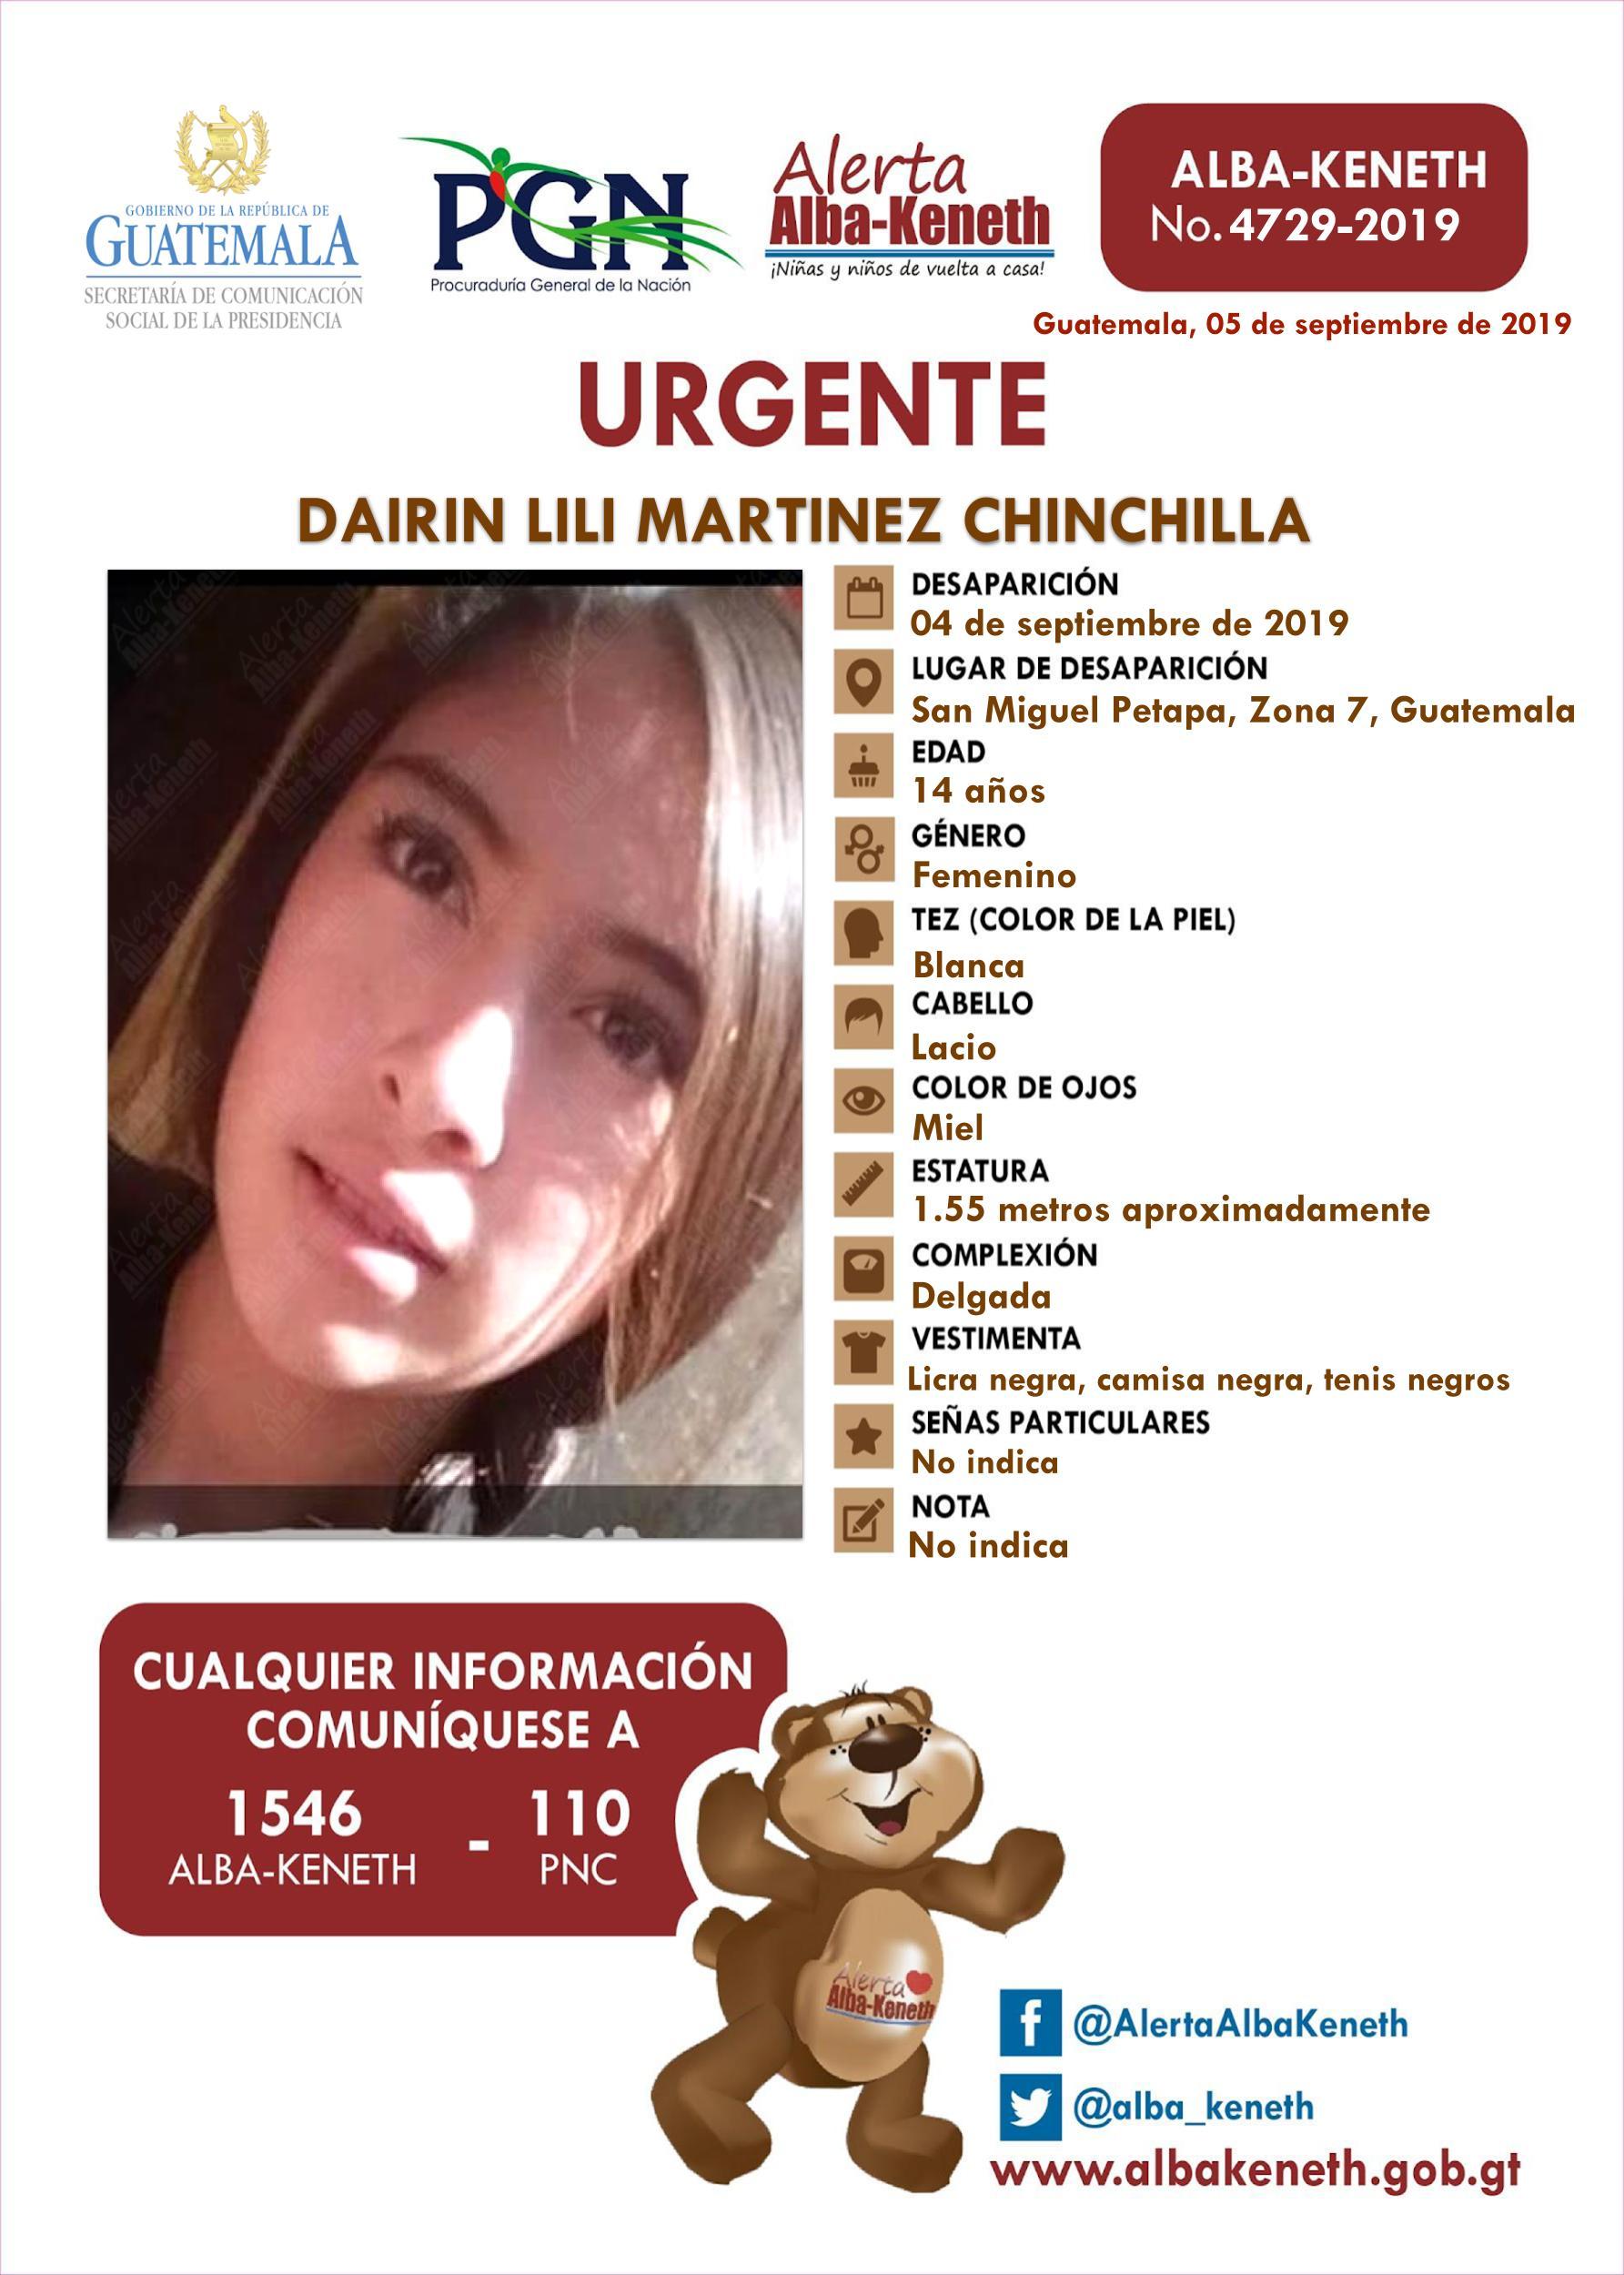 Dairin Lili Martinez Chinchilla